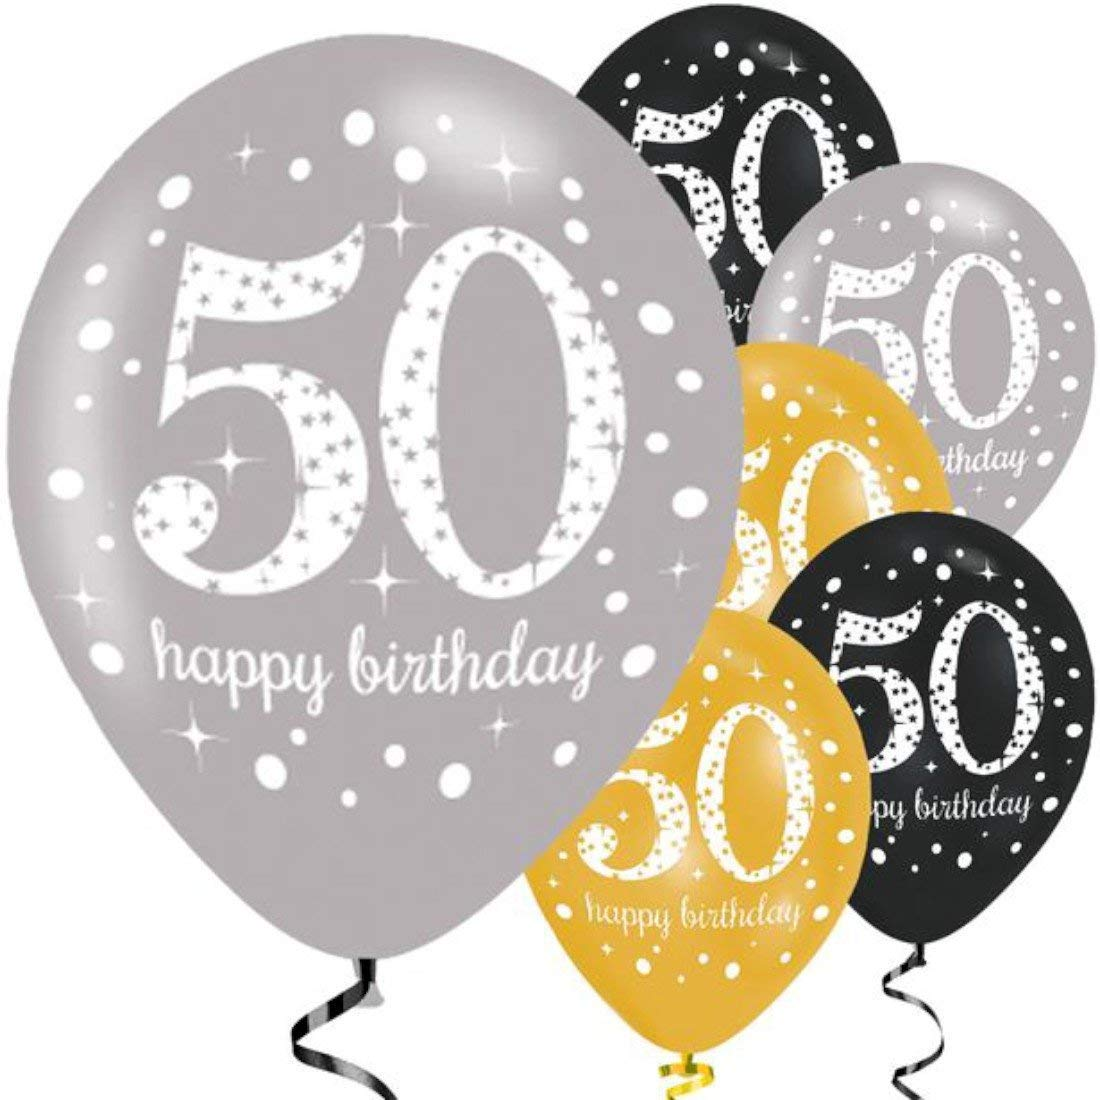 Amscan 9900740 27.5 Inch Celebration 50th Latex Balloons